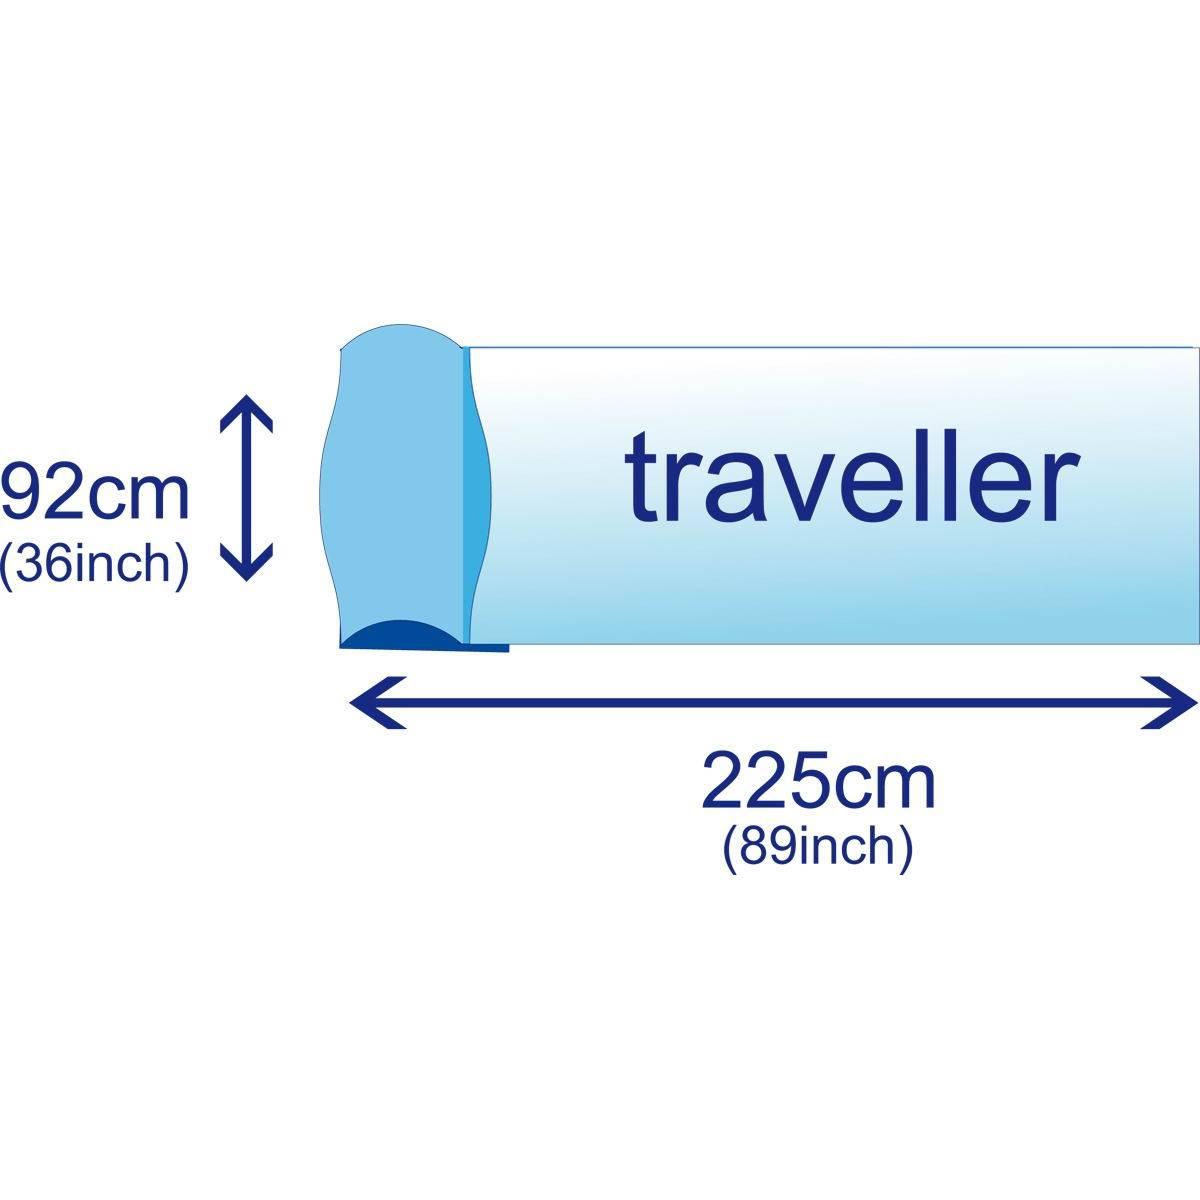 Rab Cotton Liner Traveller - Inlett - Bild 2